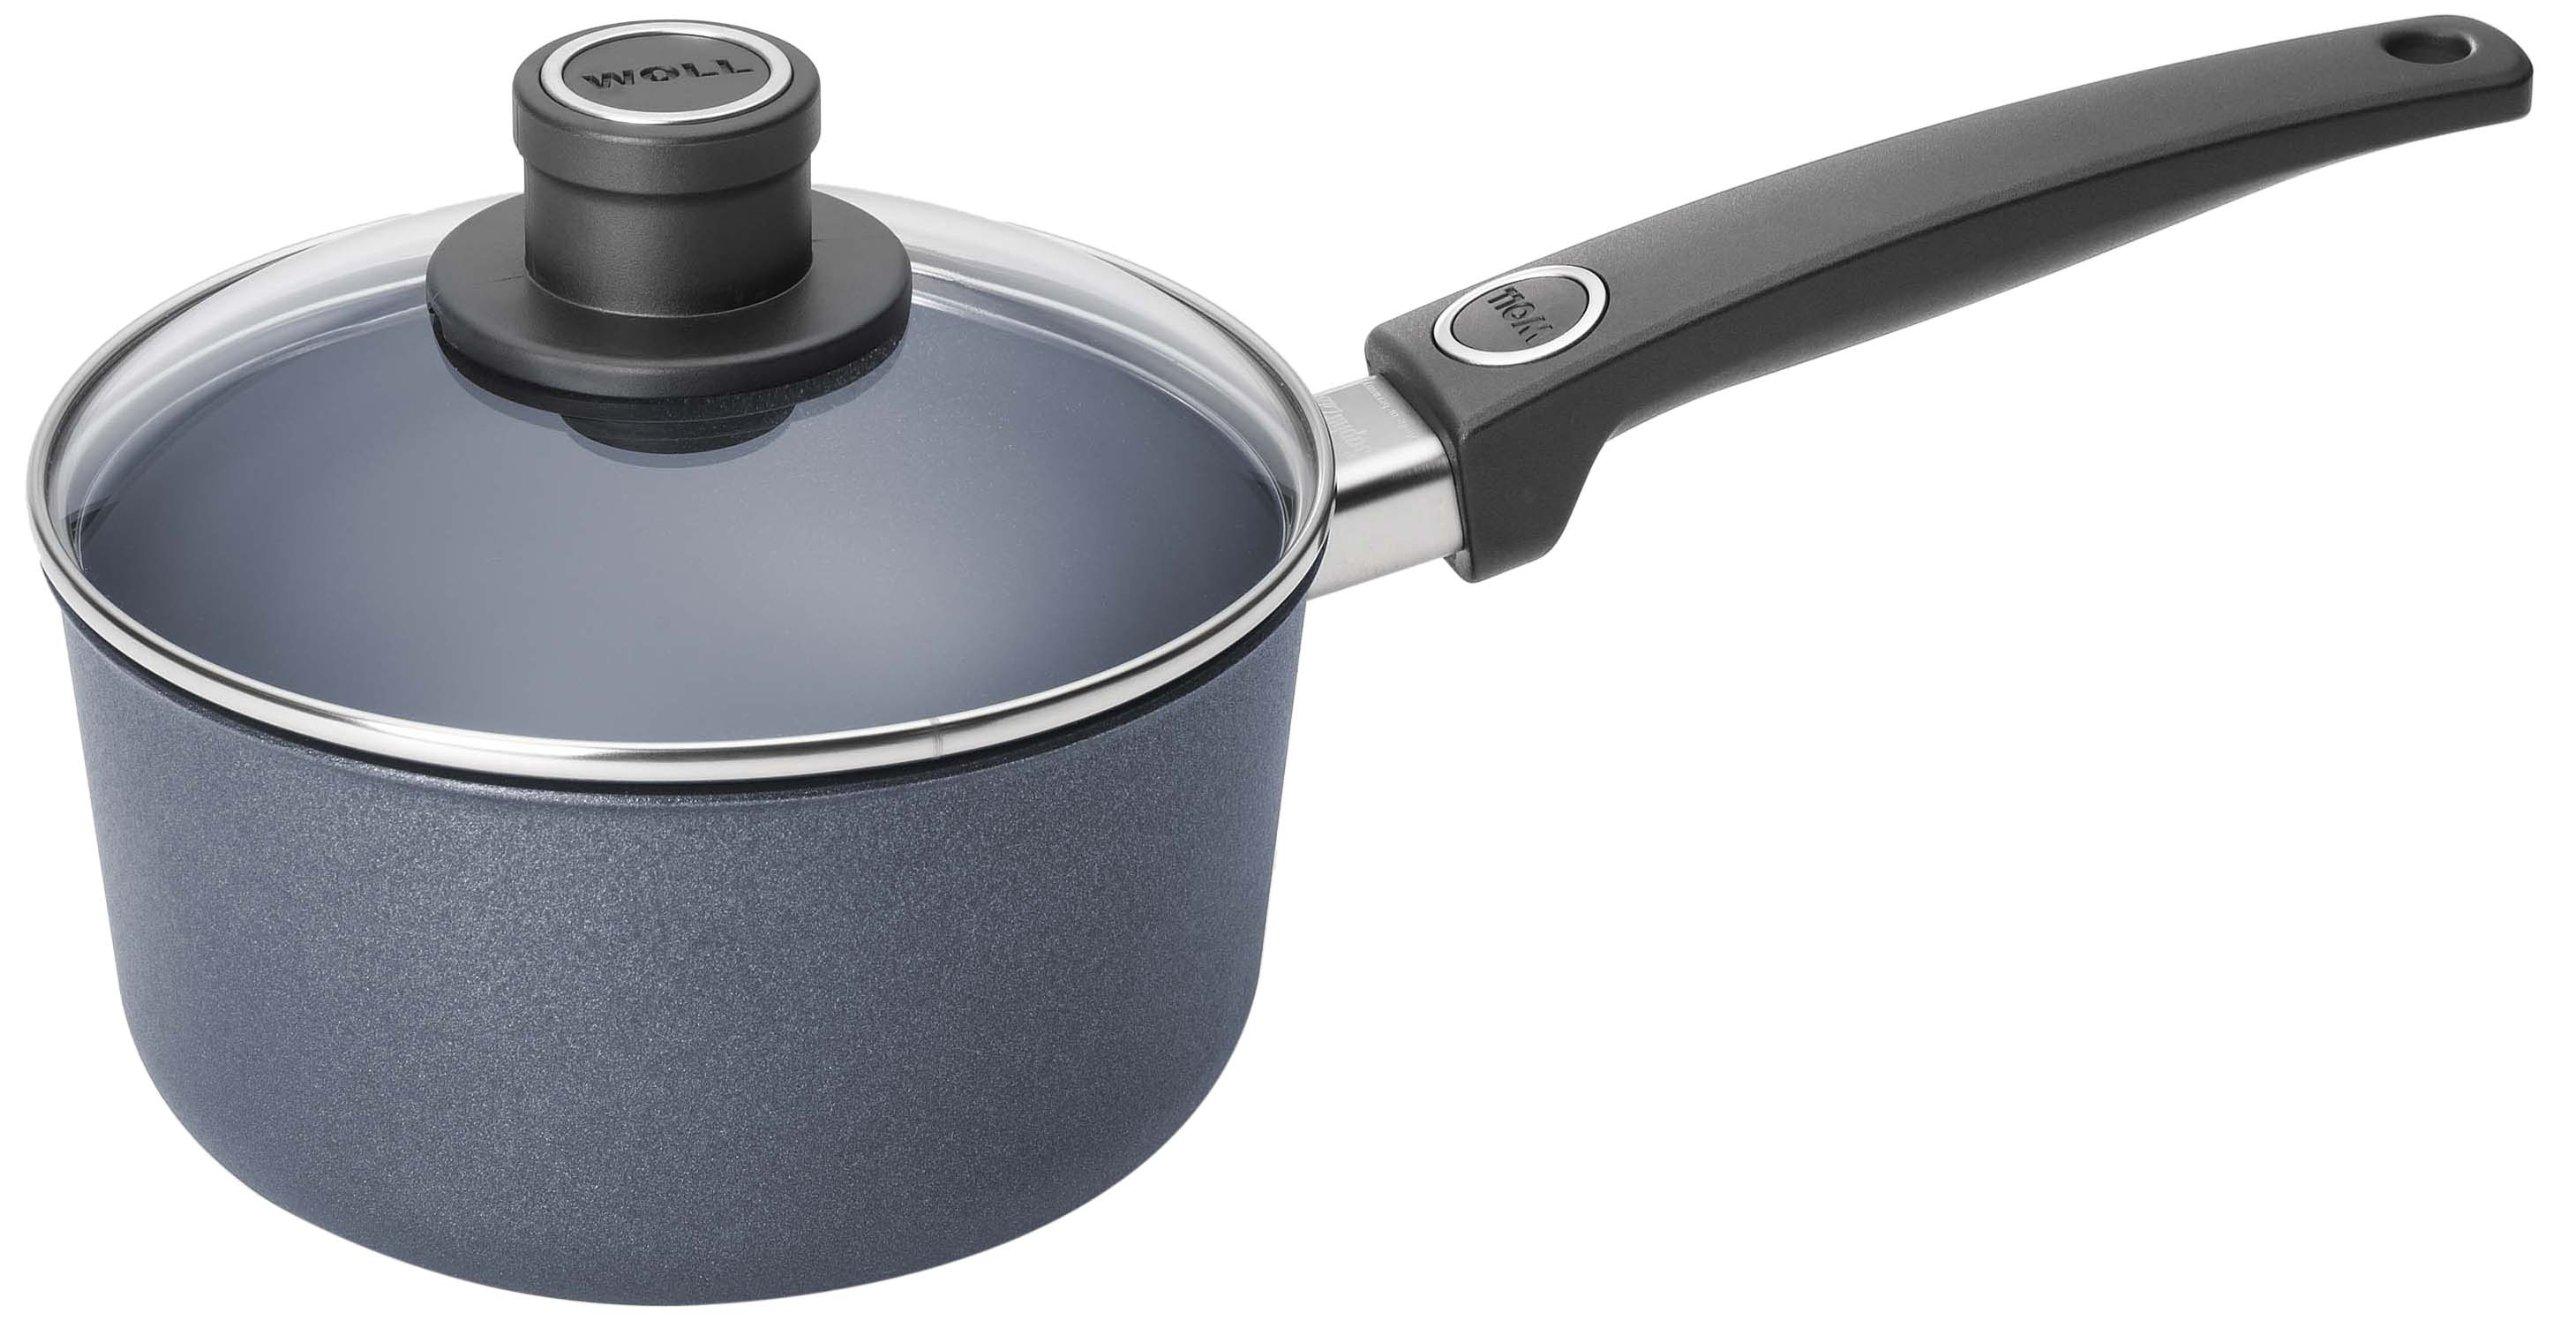 Woll W918DPSL Plus/Diamond Lite Sauce Pan, 2-Quart Saucepan with Lid,